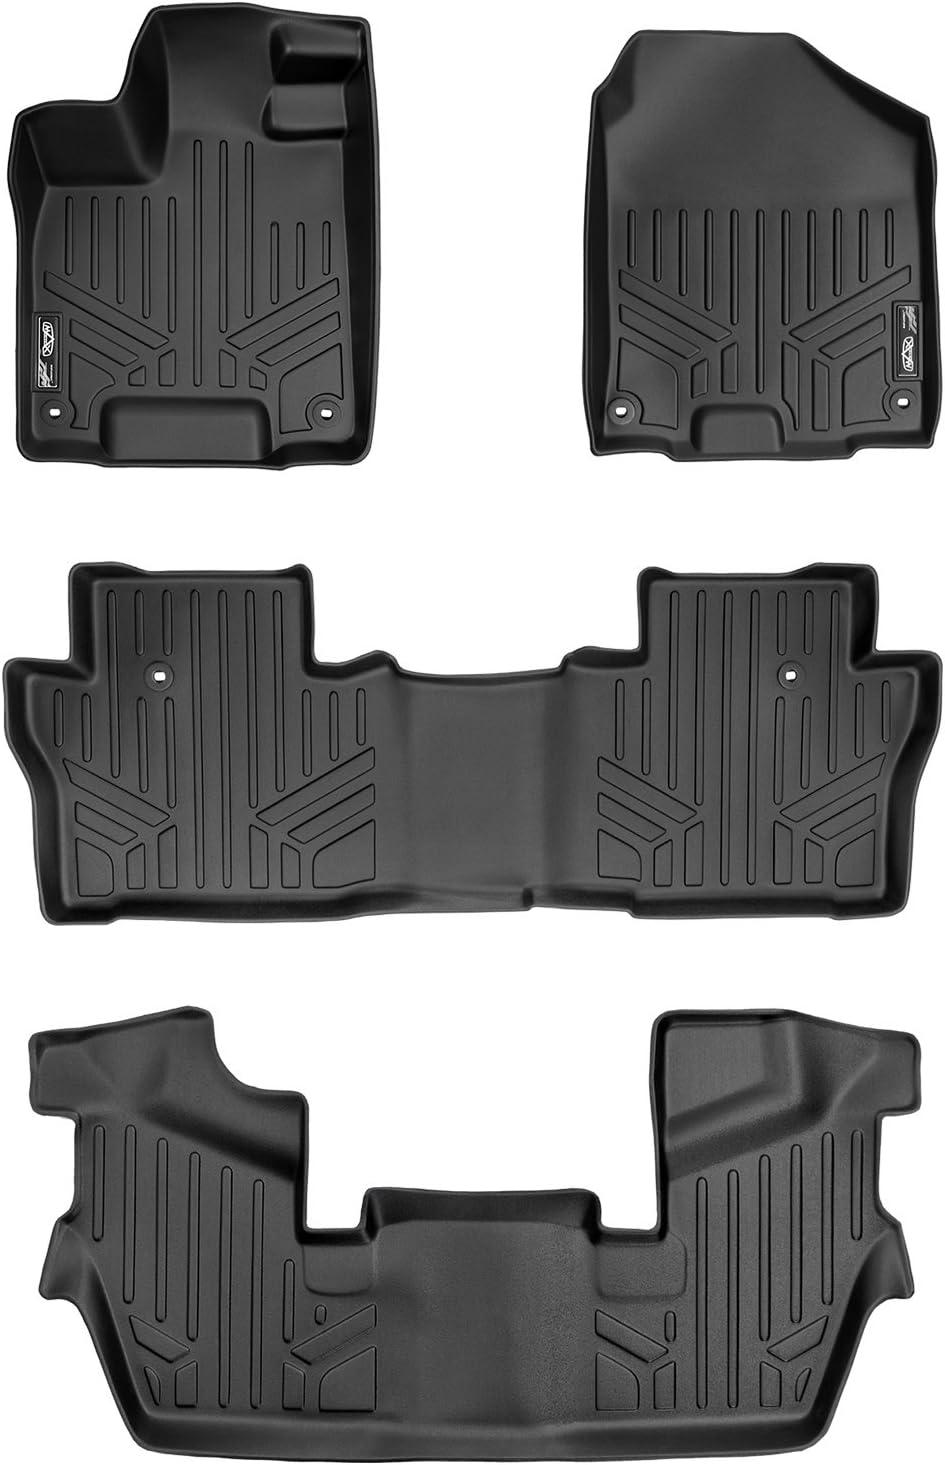 3 Row MAXFLOORMAT All Weather Custom Fit Floor Mats Liner Set for Pilot Black